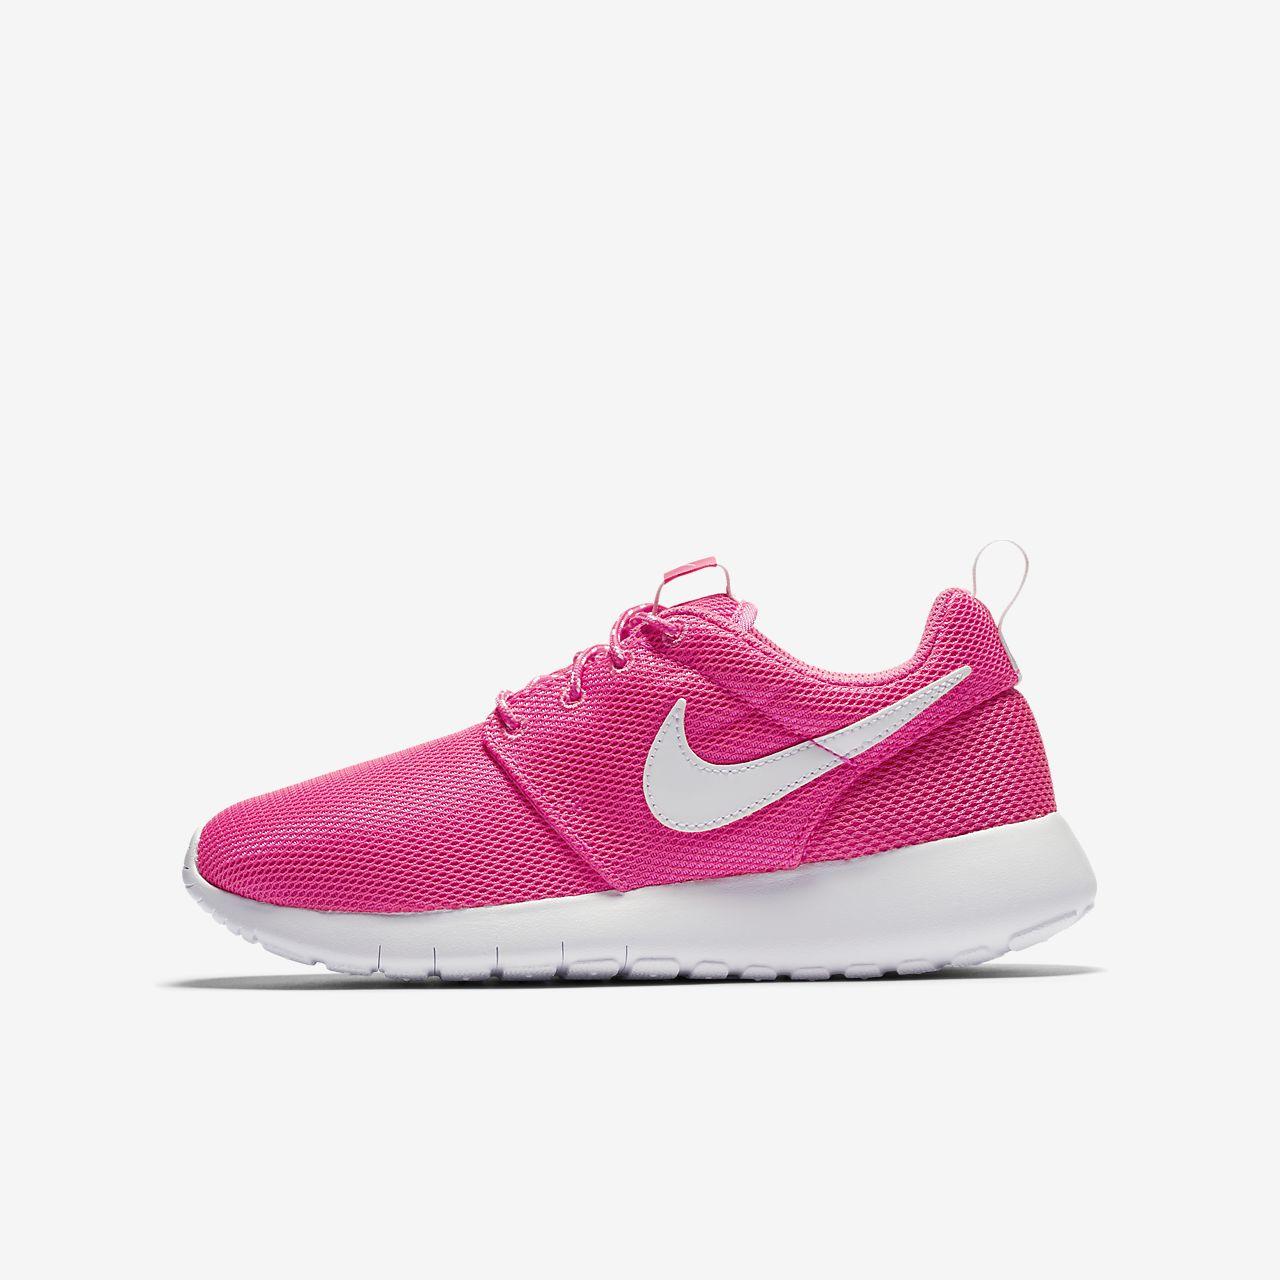 newest 3accb a7a4d ... Scarpa Nike Roshe One - Ragazzi